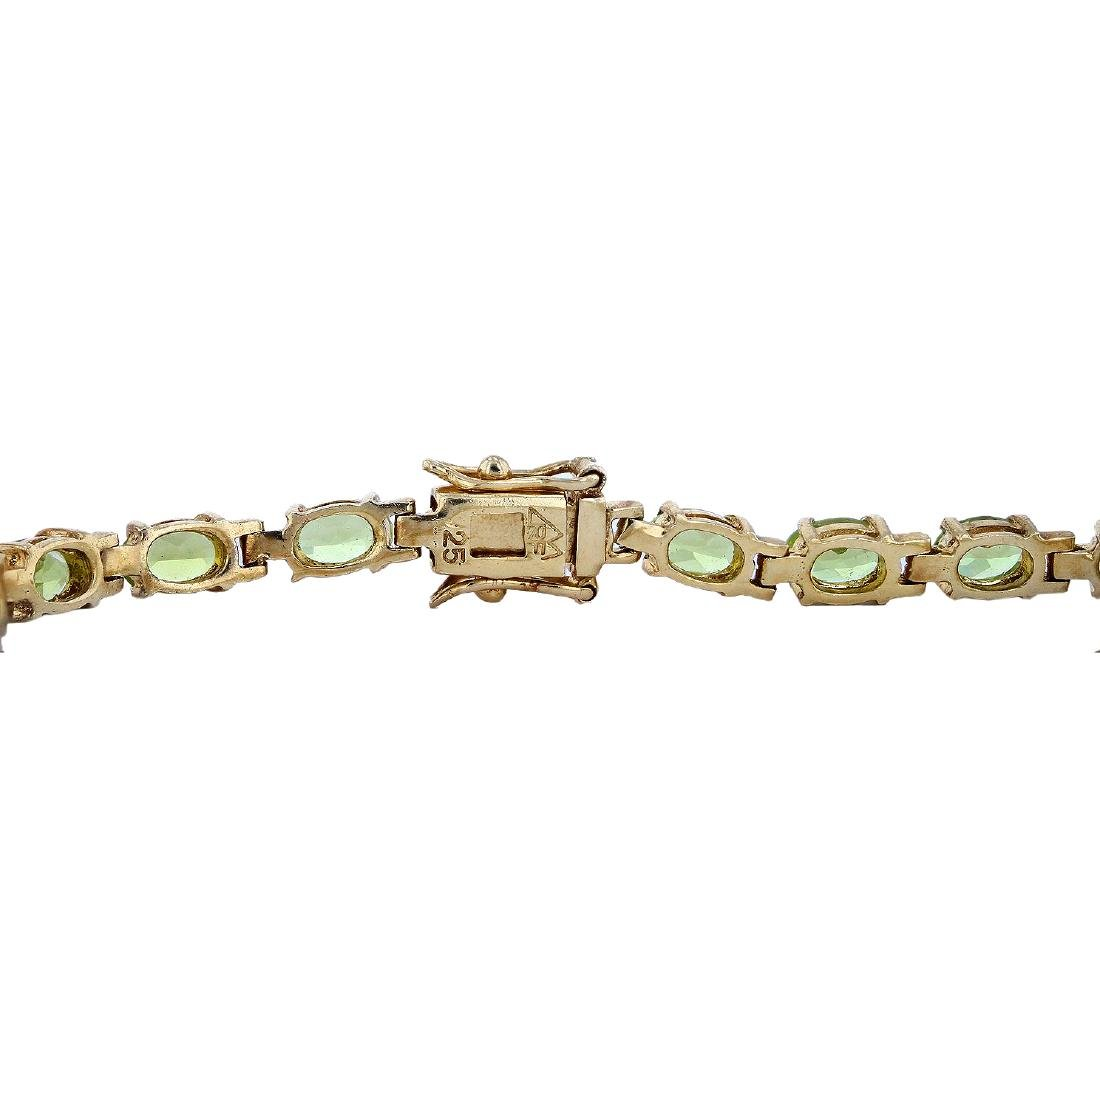 SILVER 8.80ctw Peridot Bracelet - 3